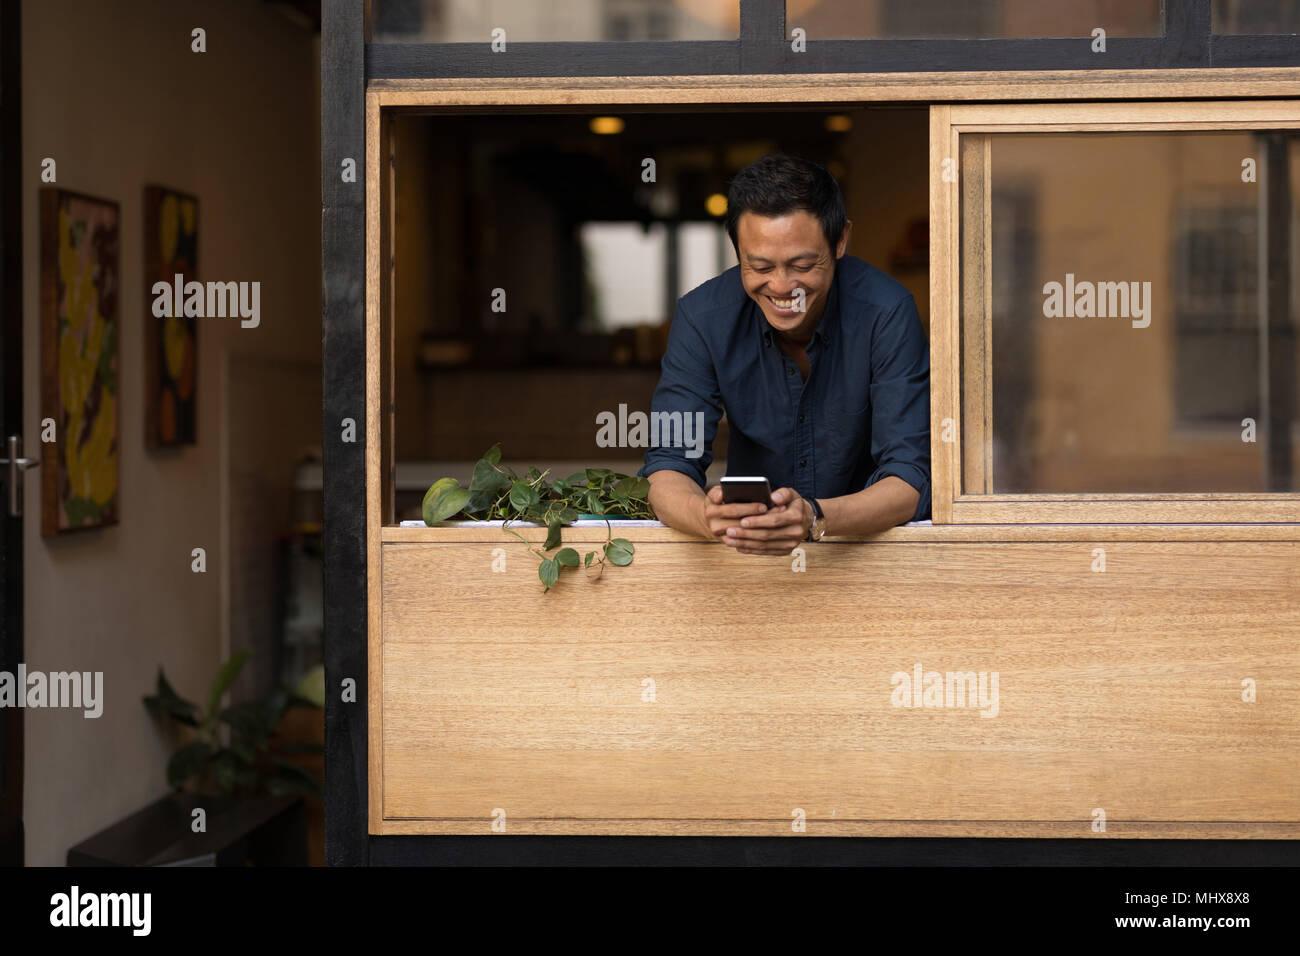 Geschäftsmann mit Mobiltelefon im Cafe Stockbild